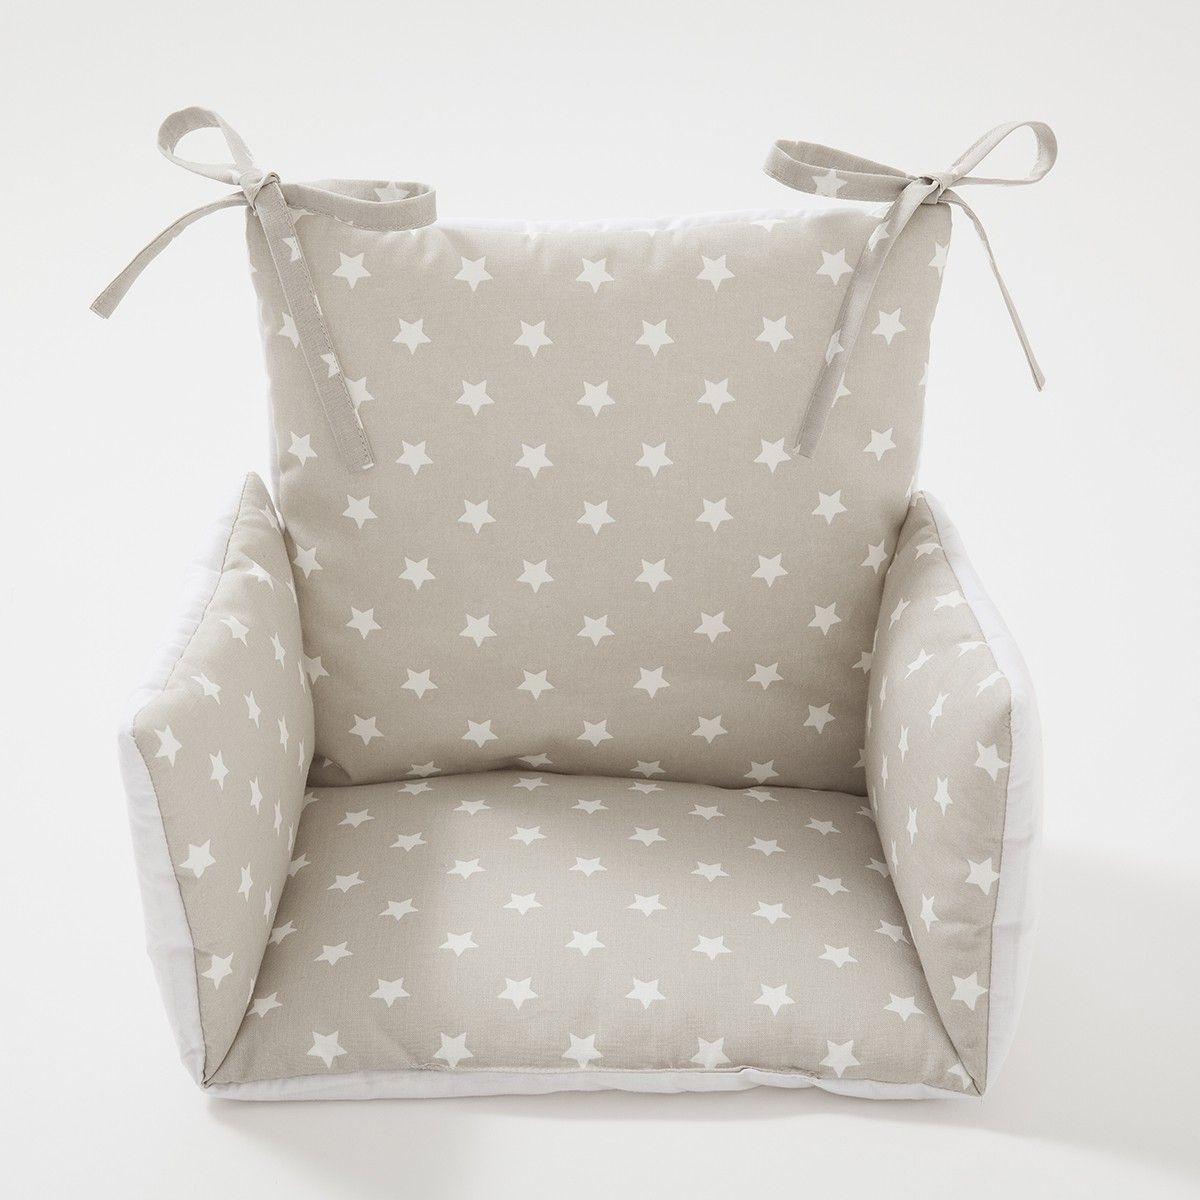 Coussin chaise haute Etoile gris perle | Babies on